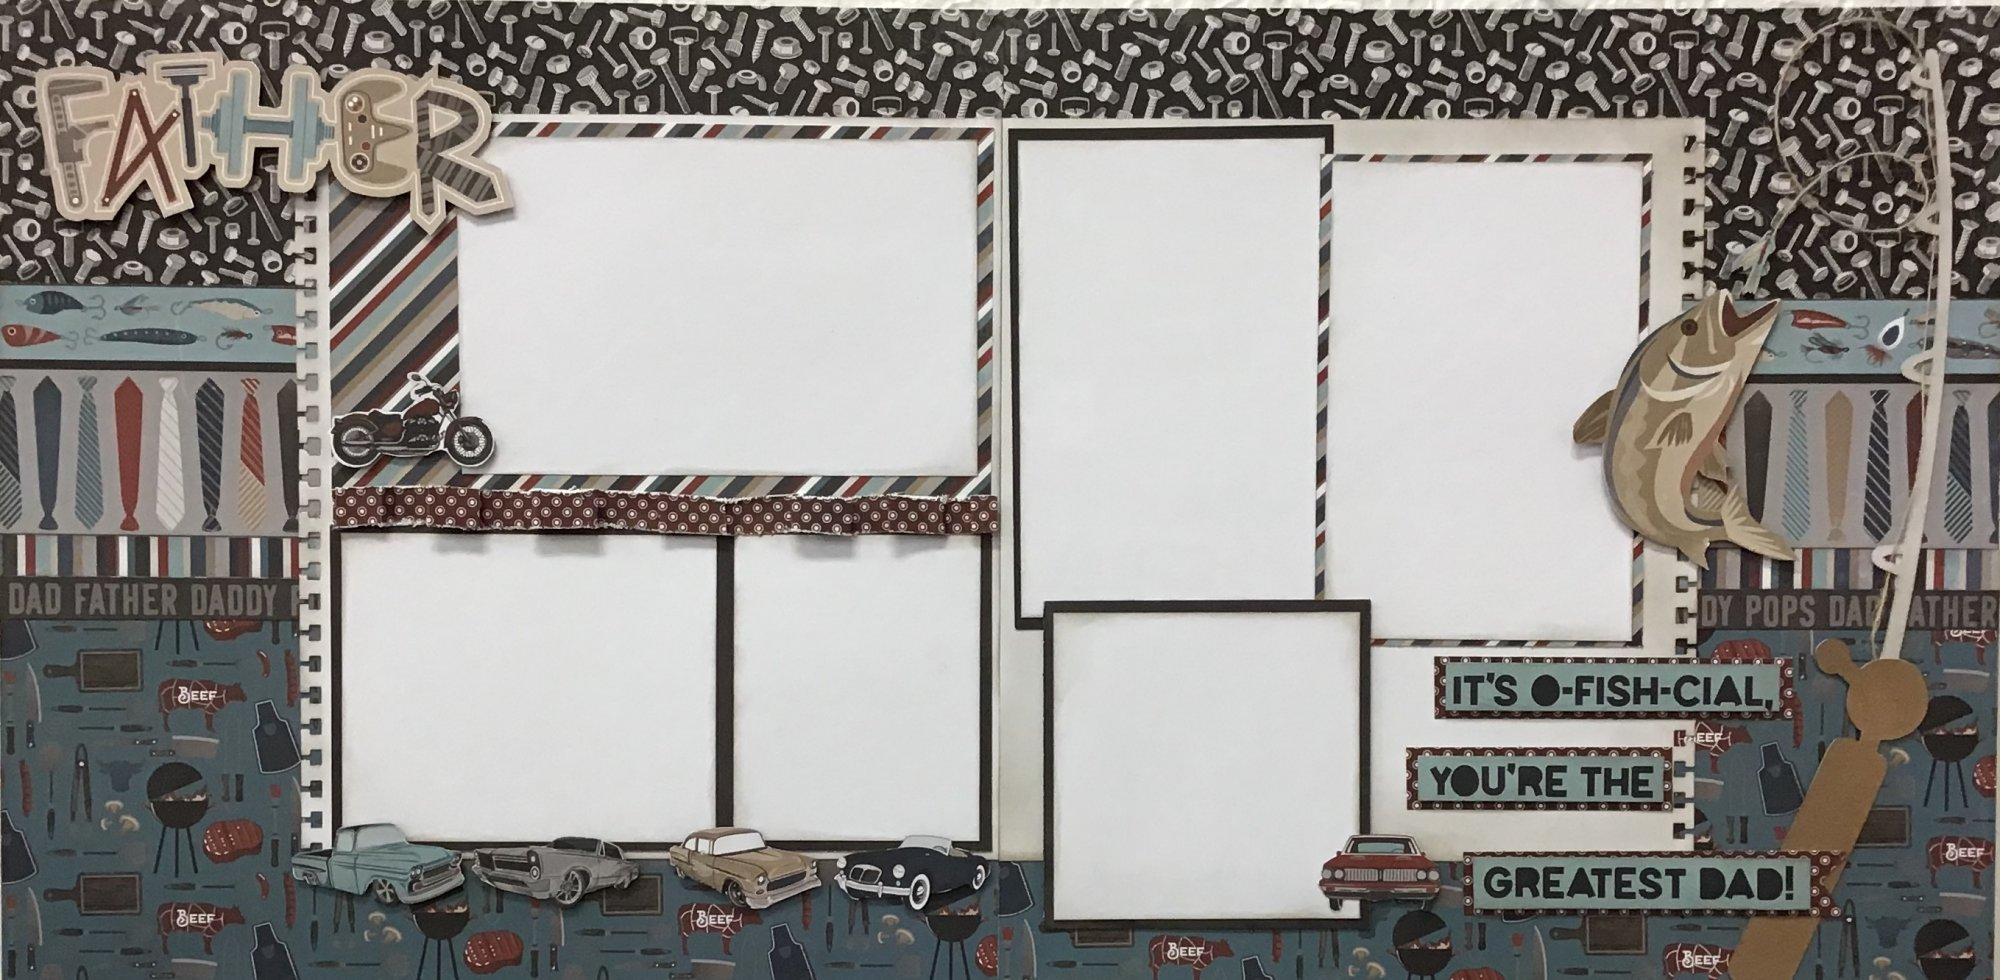 Father 12x12 Scrapbook kit layout